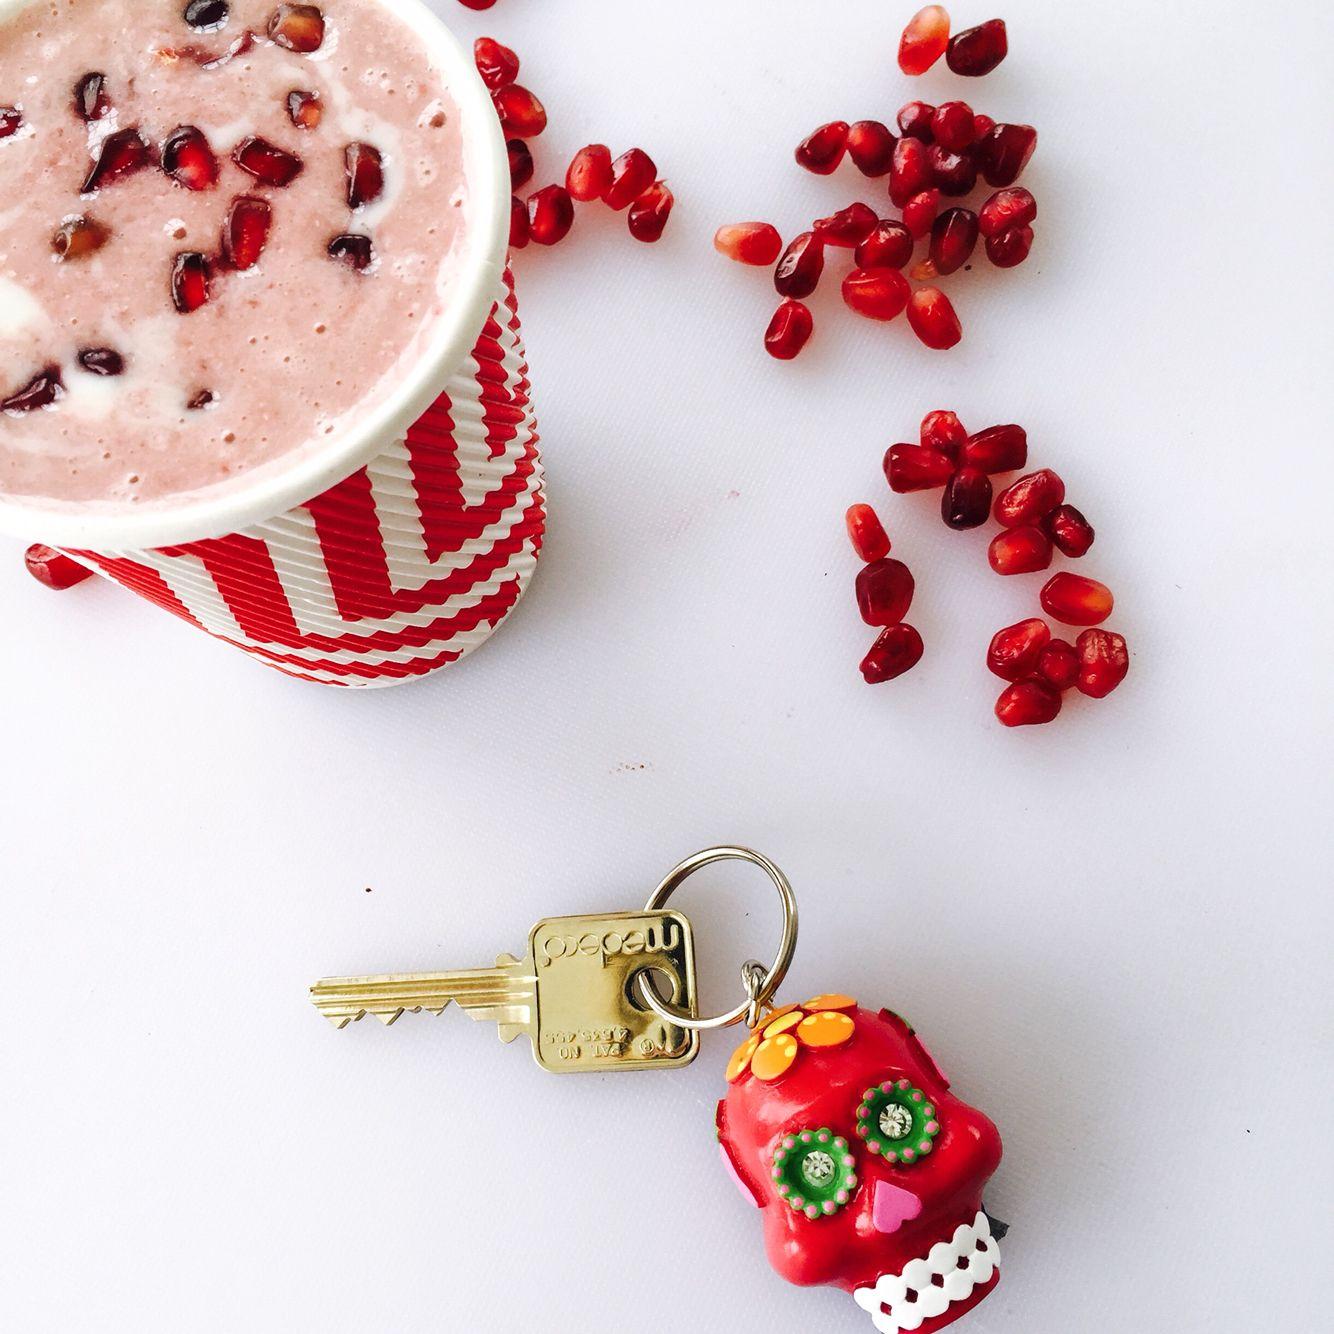 Pomegranate To Go Smoothie. Pomegranate seeds, coconut yogurt, few slices of frozen banana, vanilla, splash of fresh squeezed orange juice. http://www.pinterest.com/chakrapedia/c-h-a-k-r-a-s-h-a-k-e-s/